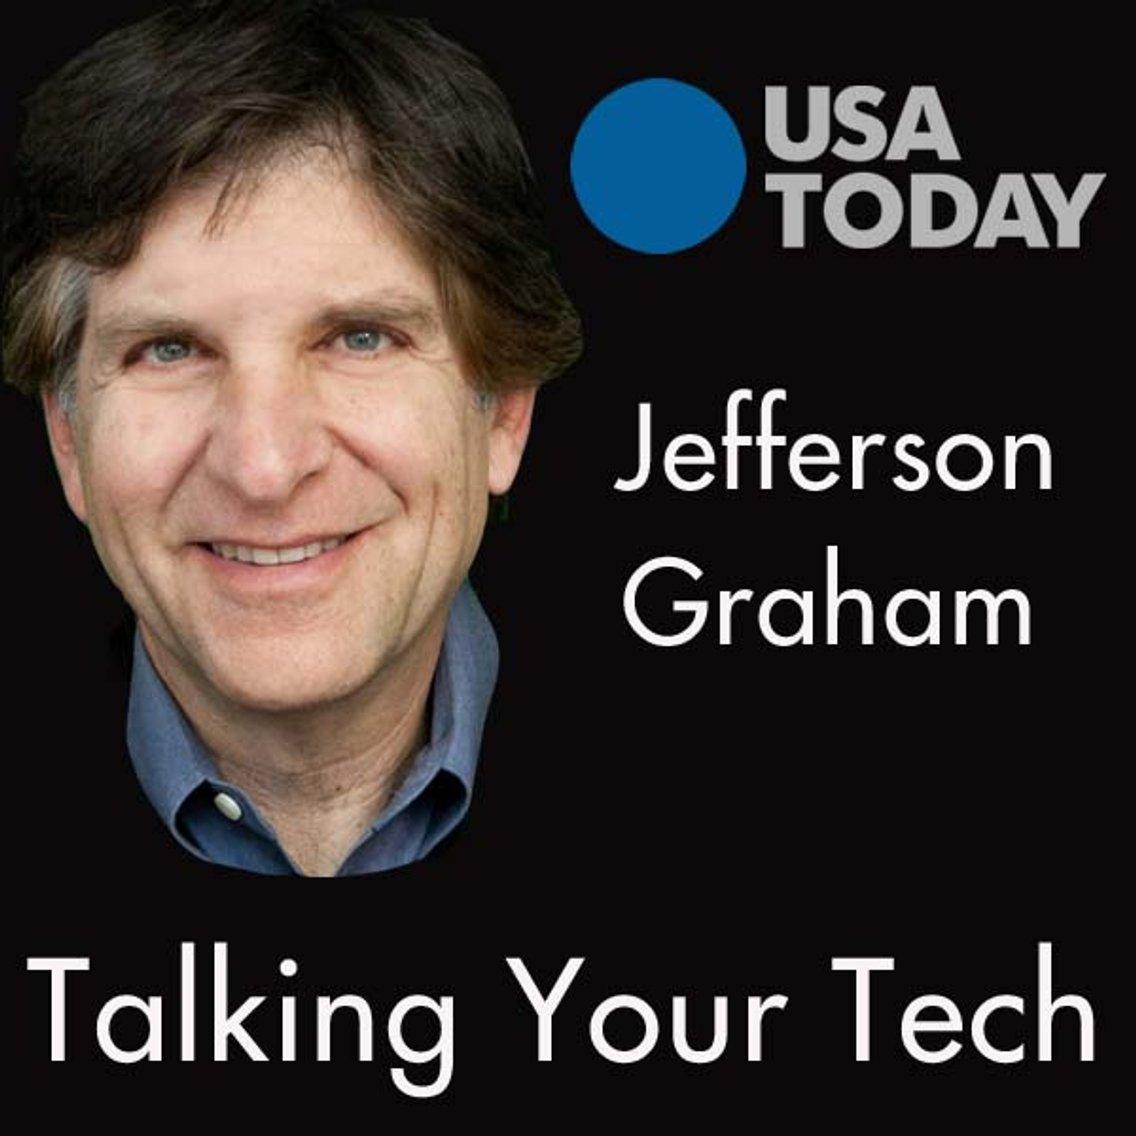 Talking Your Tech with Jefferson Graham - immagine di copertina